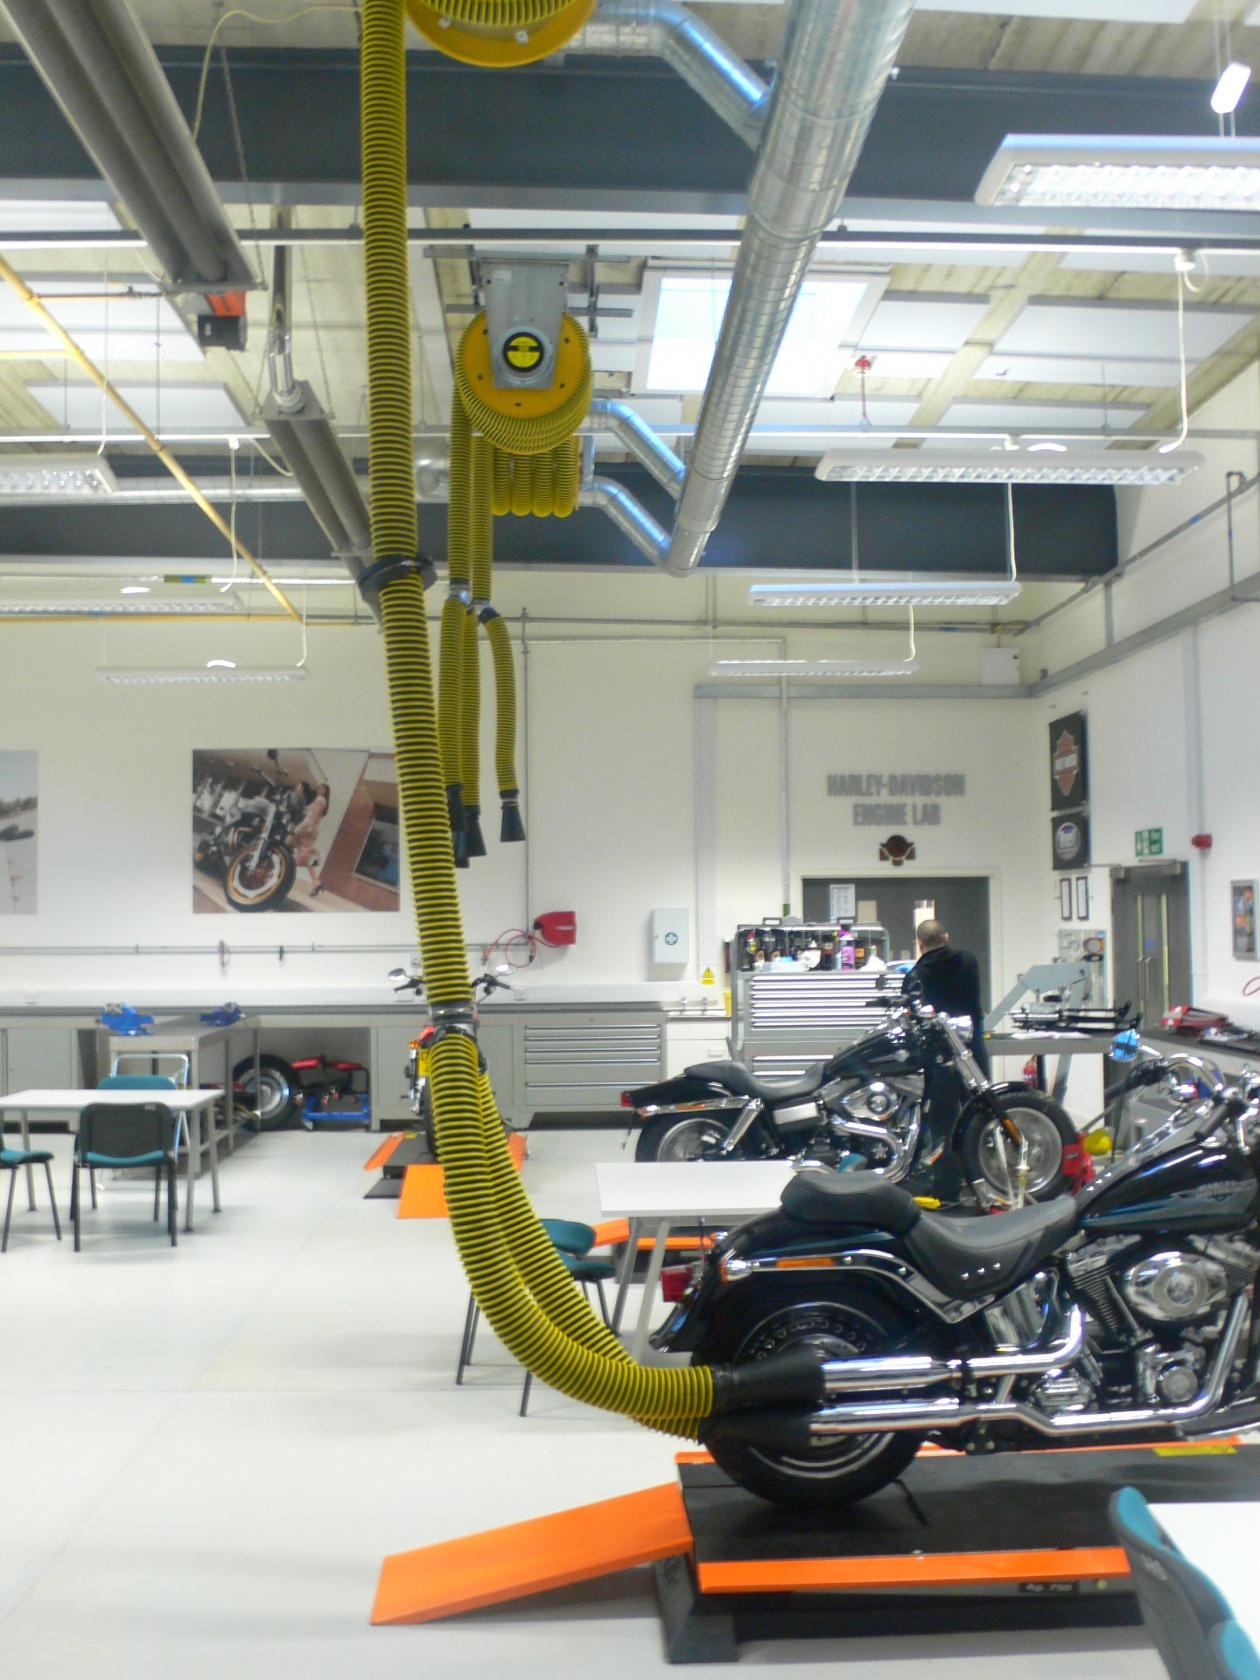 Aes Reels General Shop Equipment Exhaust Extraction